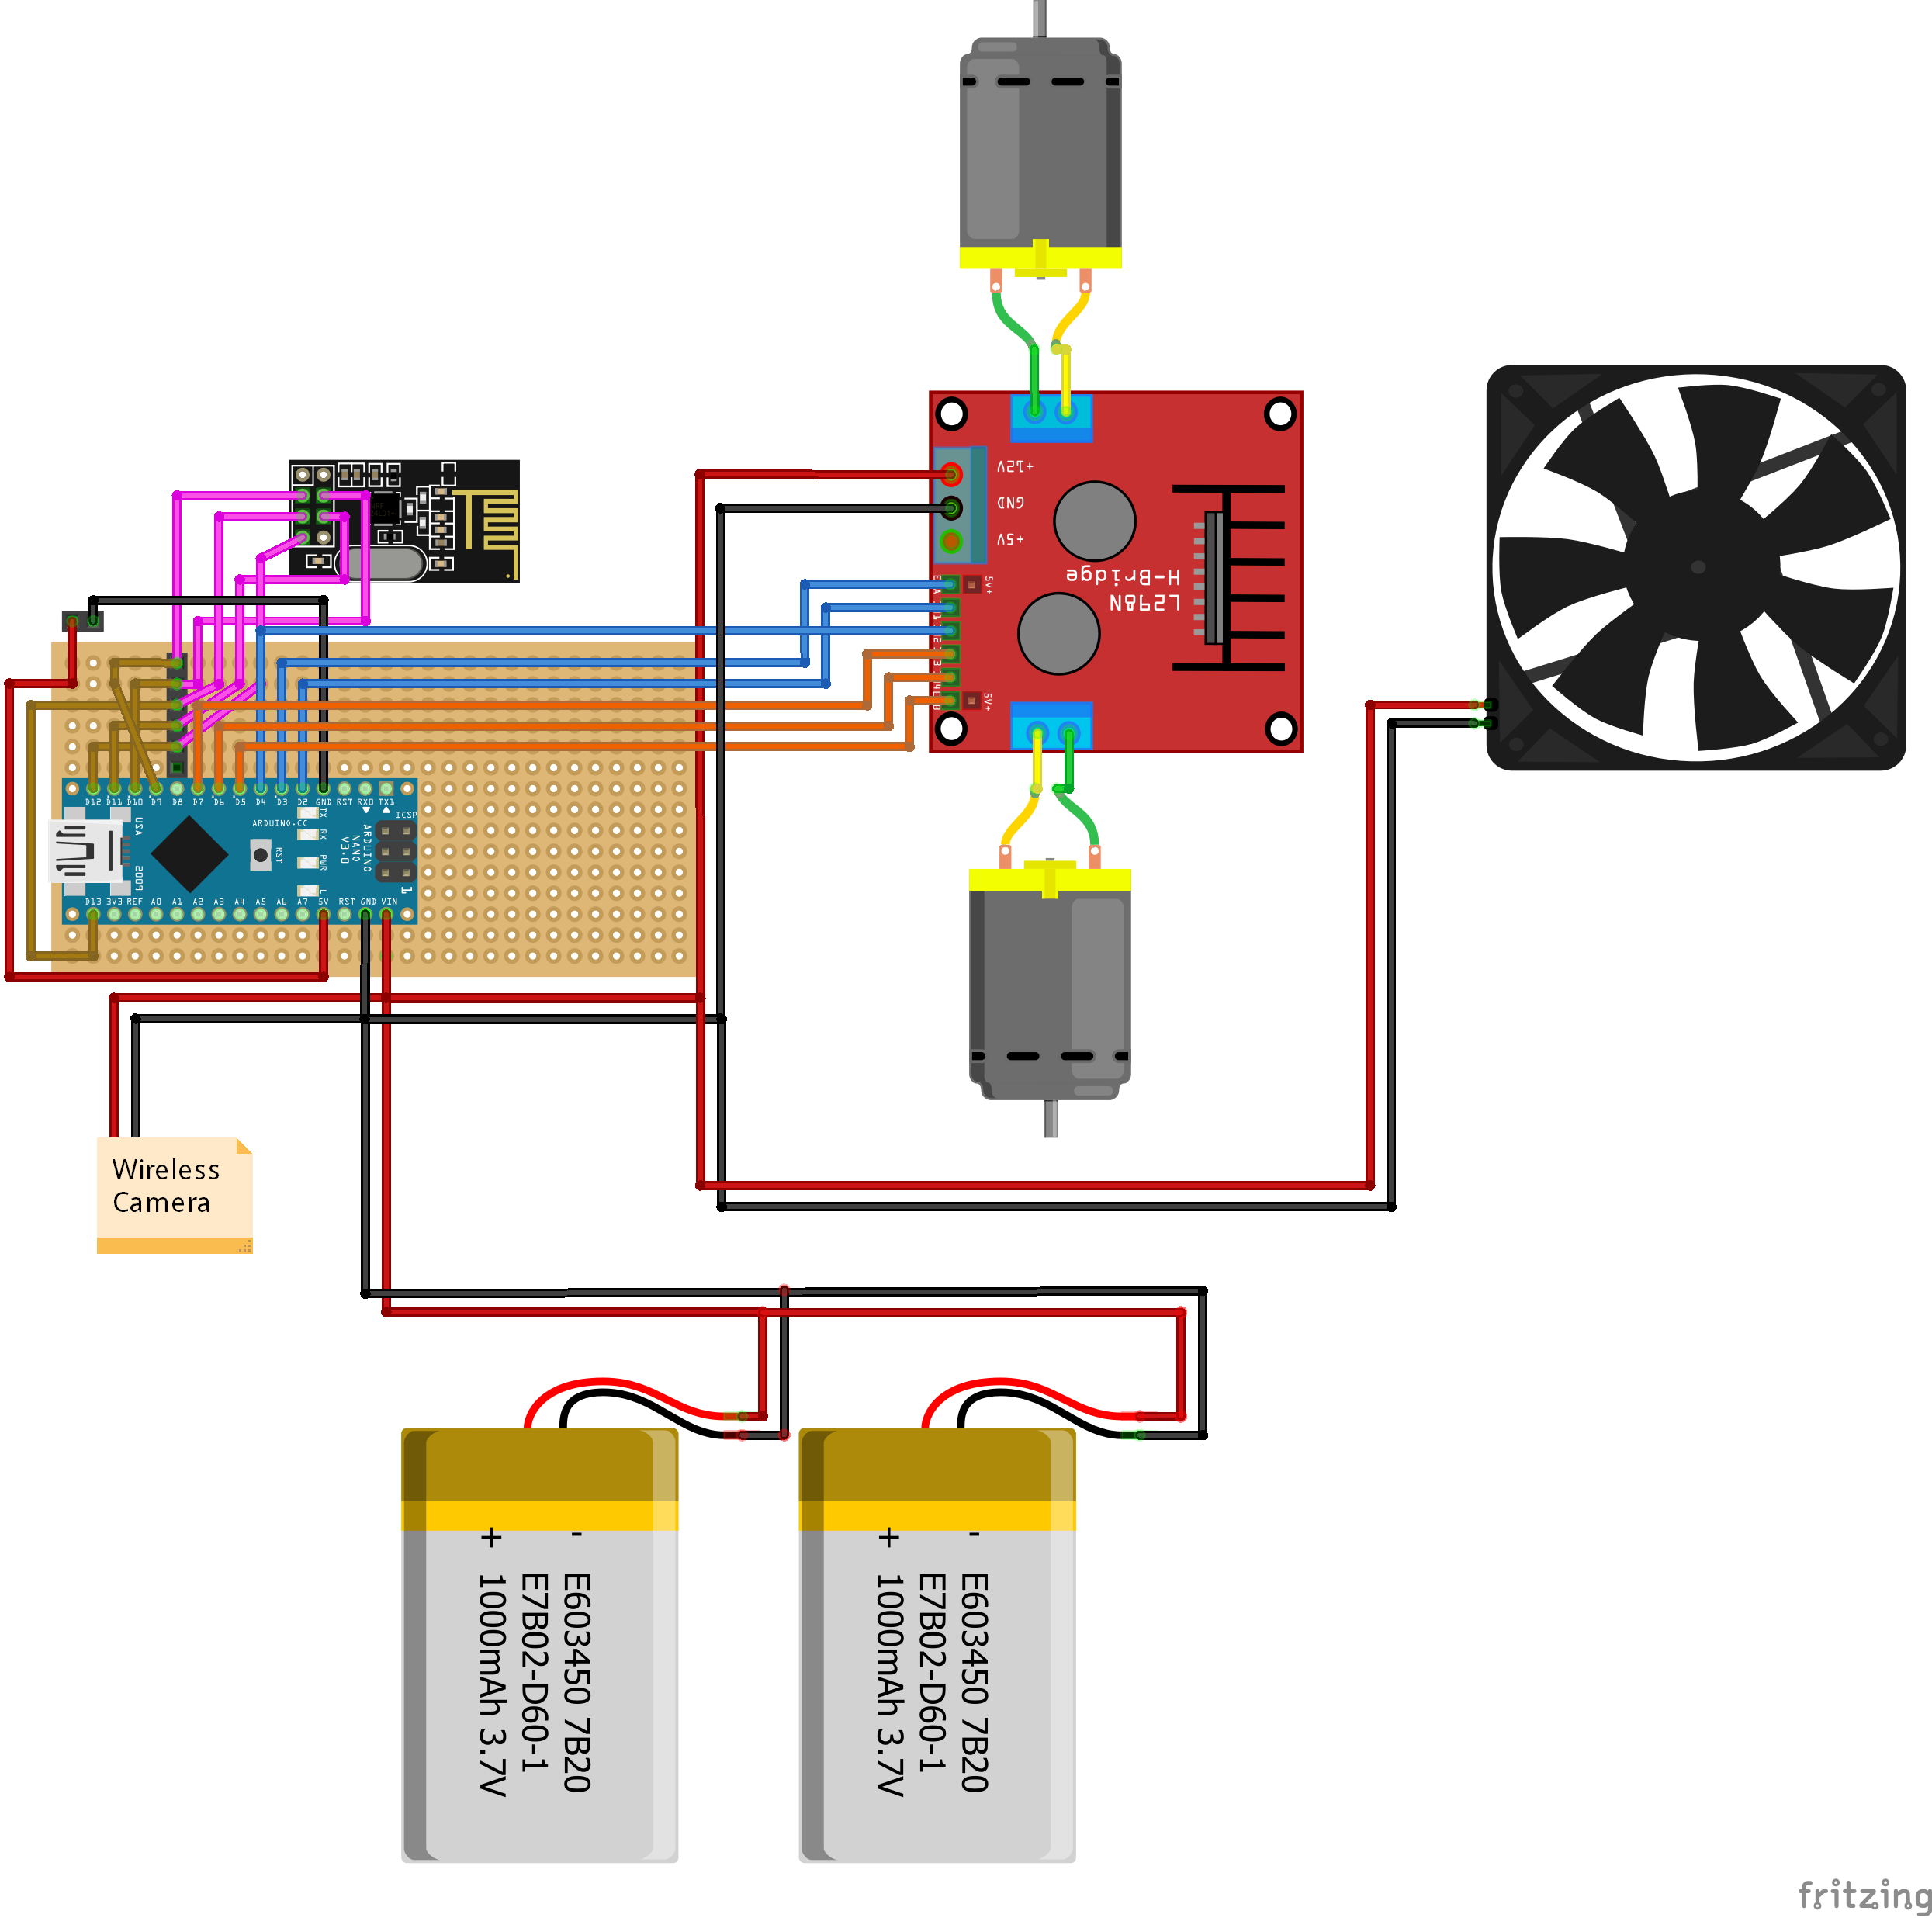 Fpv Rc Car Wireless Camera Diagram Schematic V1 1 Rx Tz6smedepk